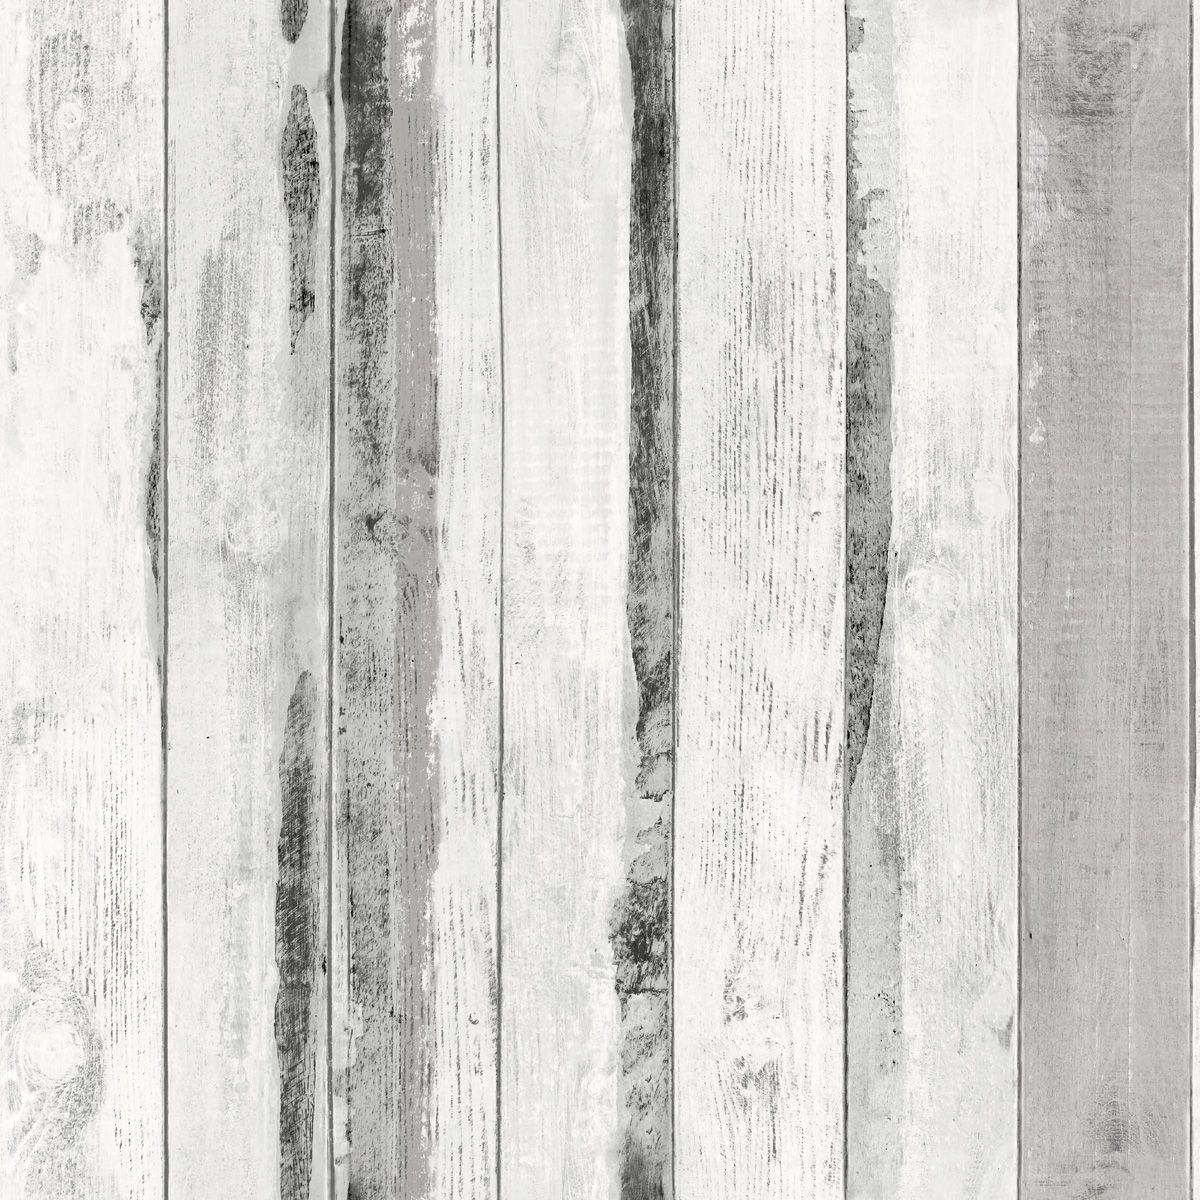 Papier Peint Bois Ardoise Woodbam Intissé Kalico